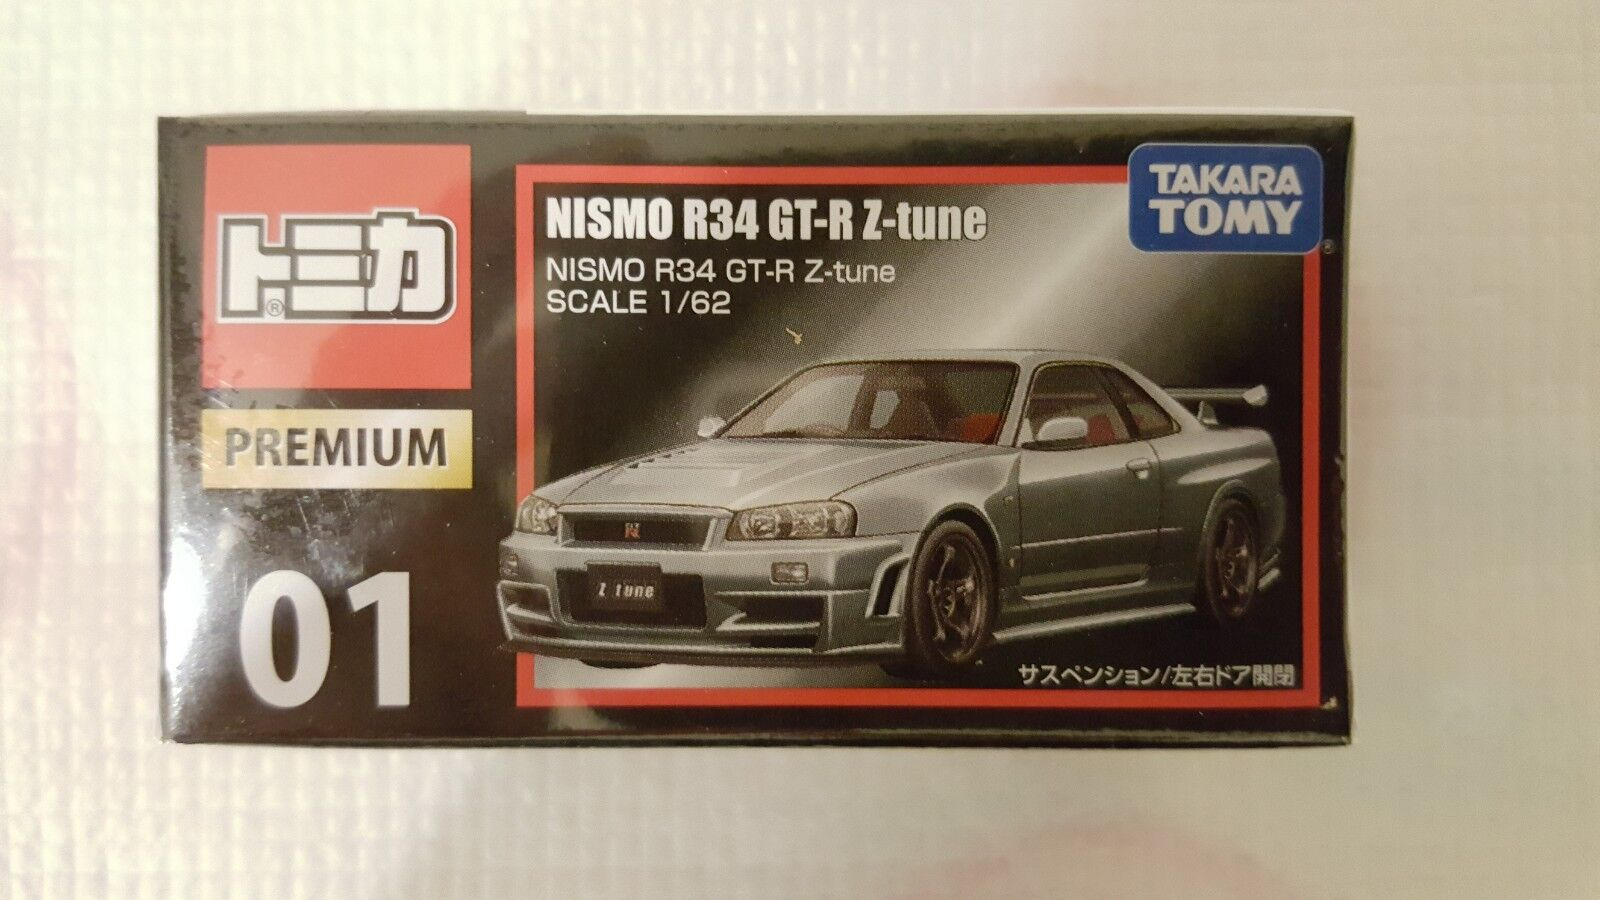 KPGC10 Japan Takara Tomy Tomica Premium 34 NISSAN SKYLINE GT-R FS